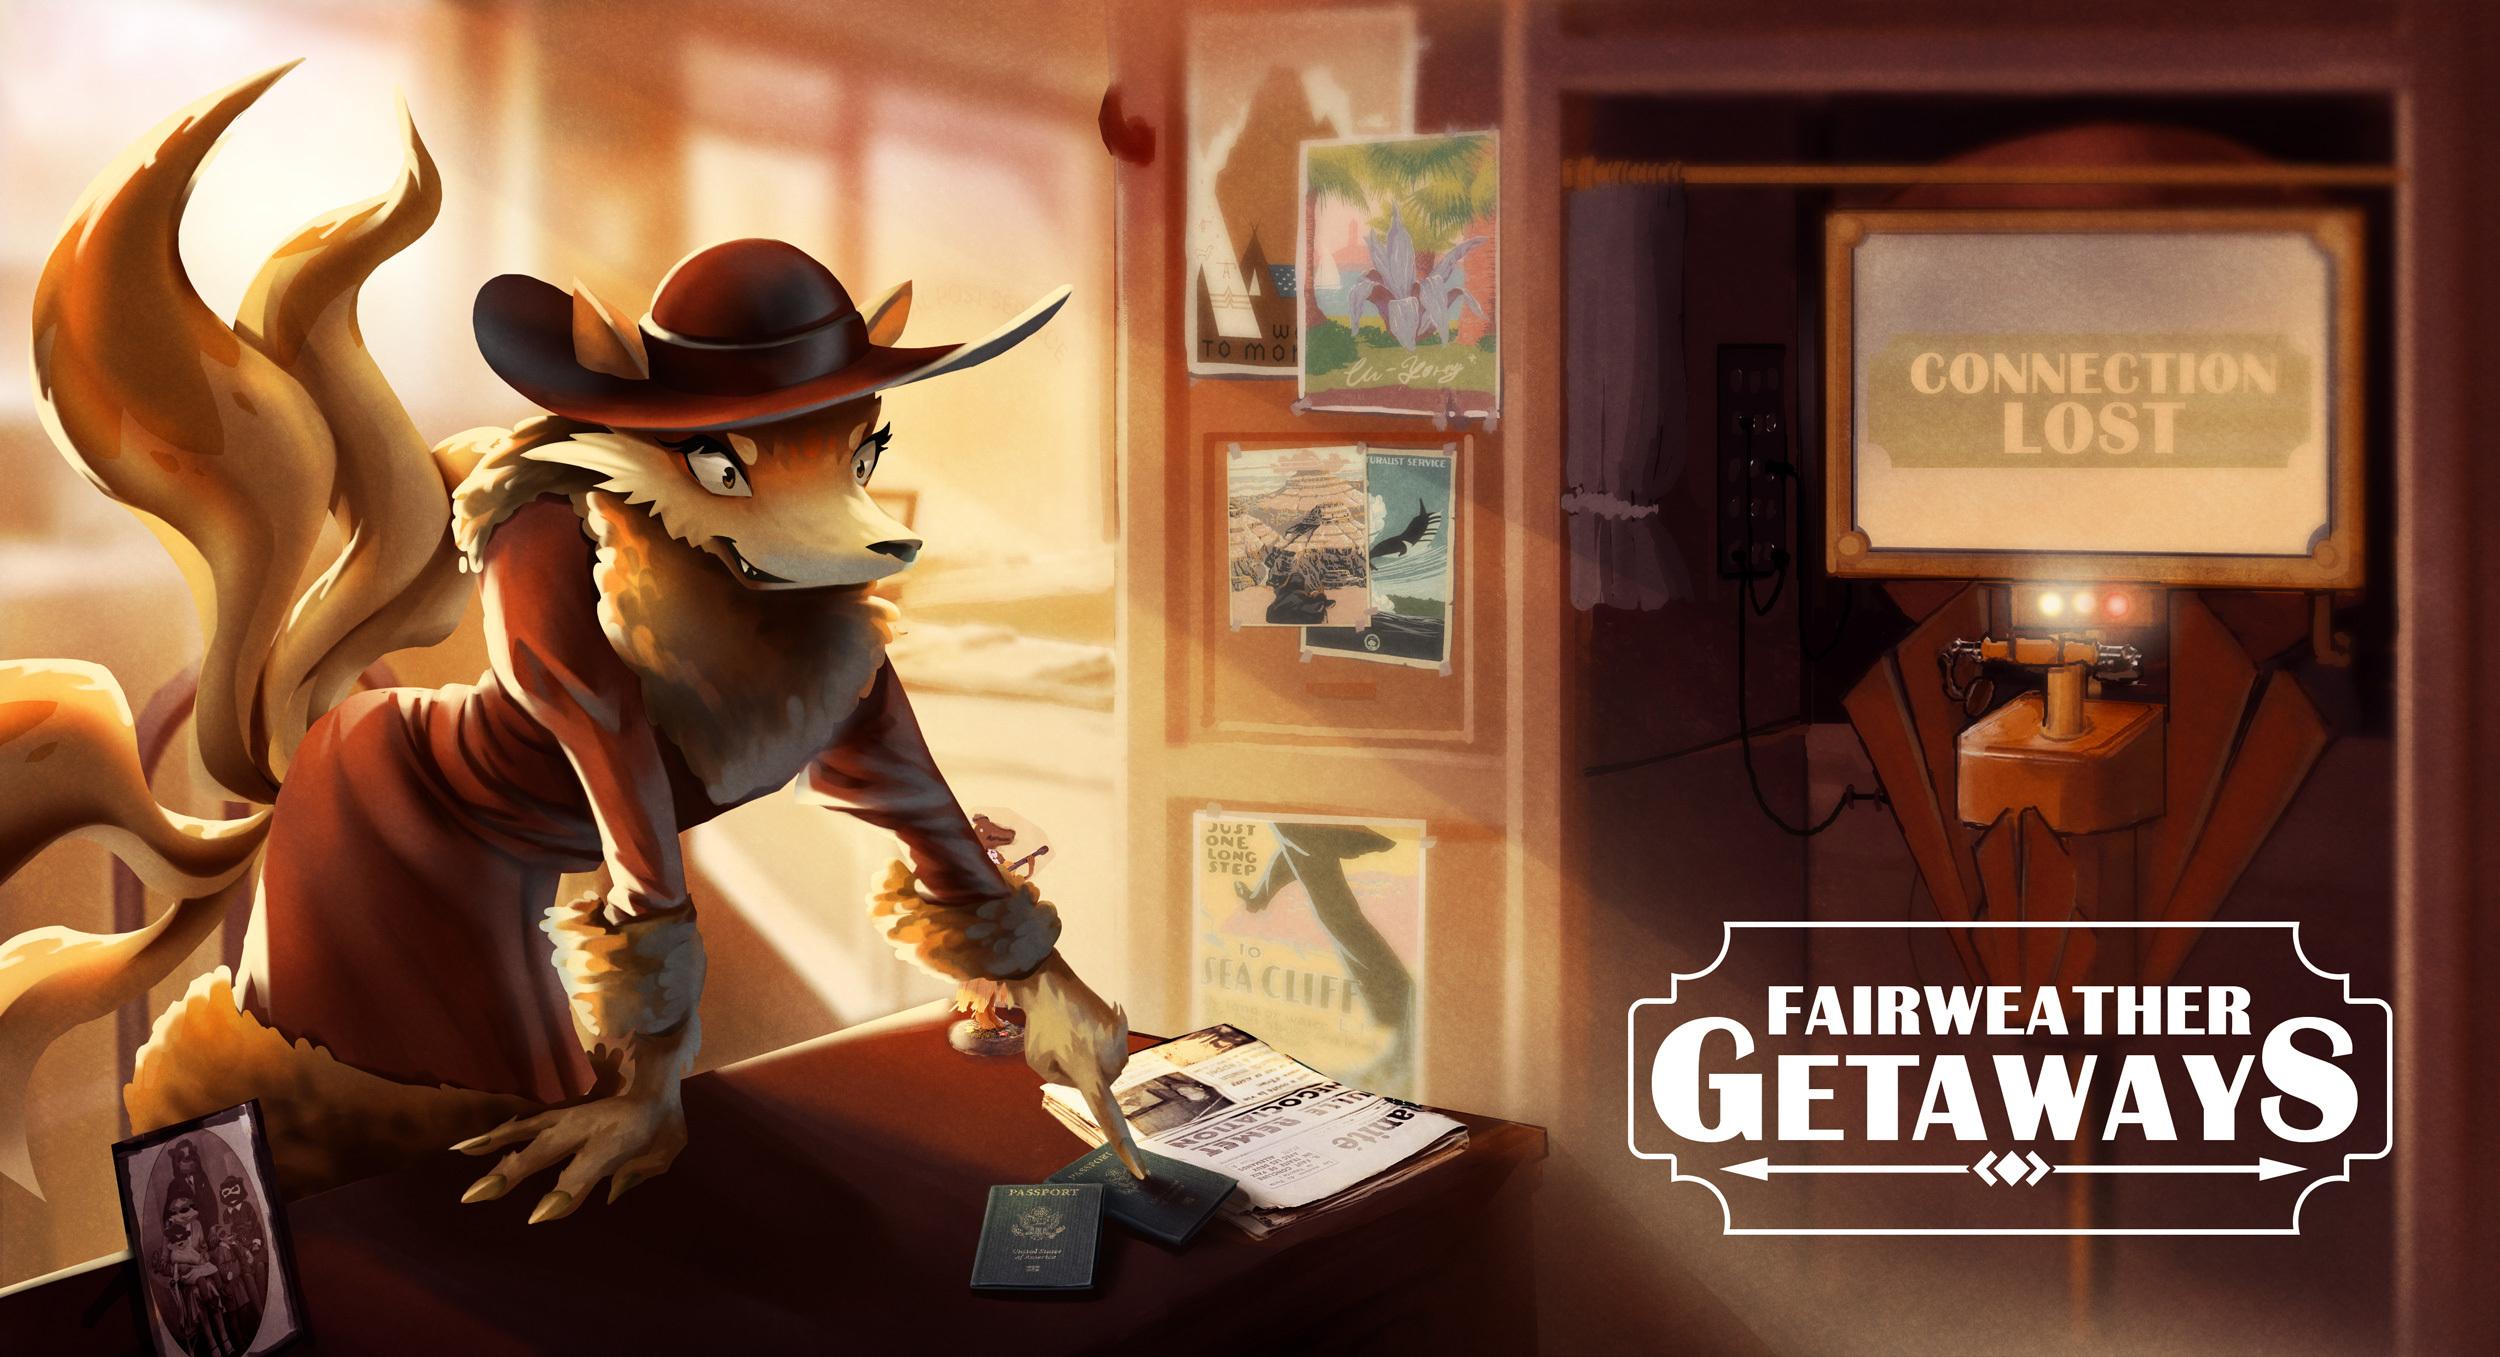 fairweather getaways